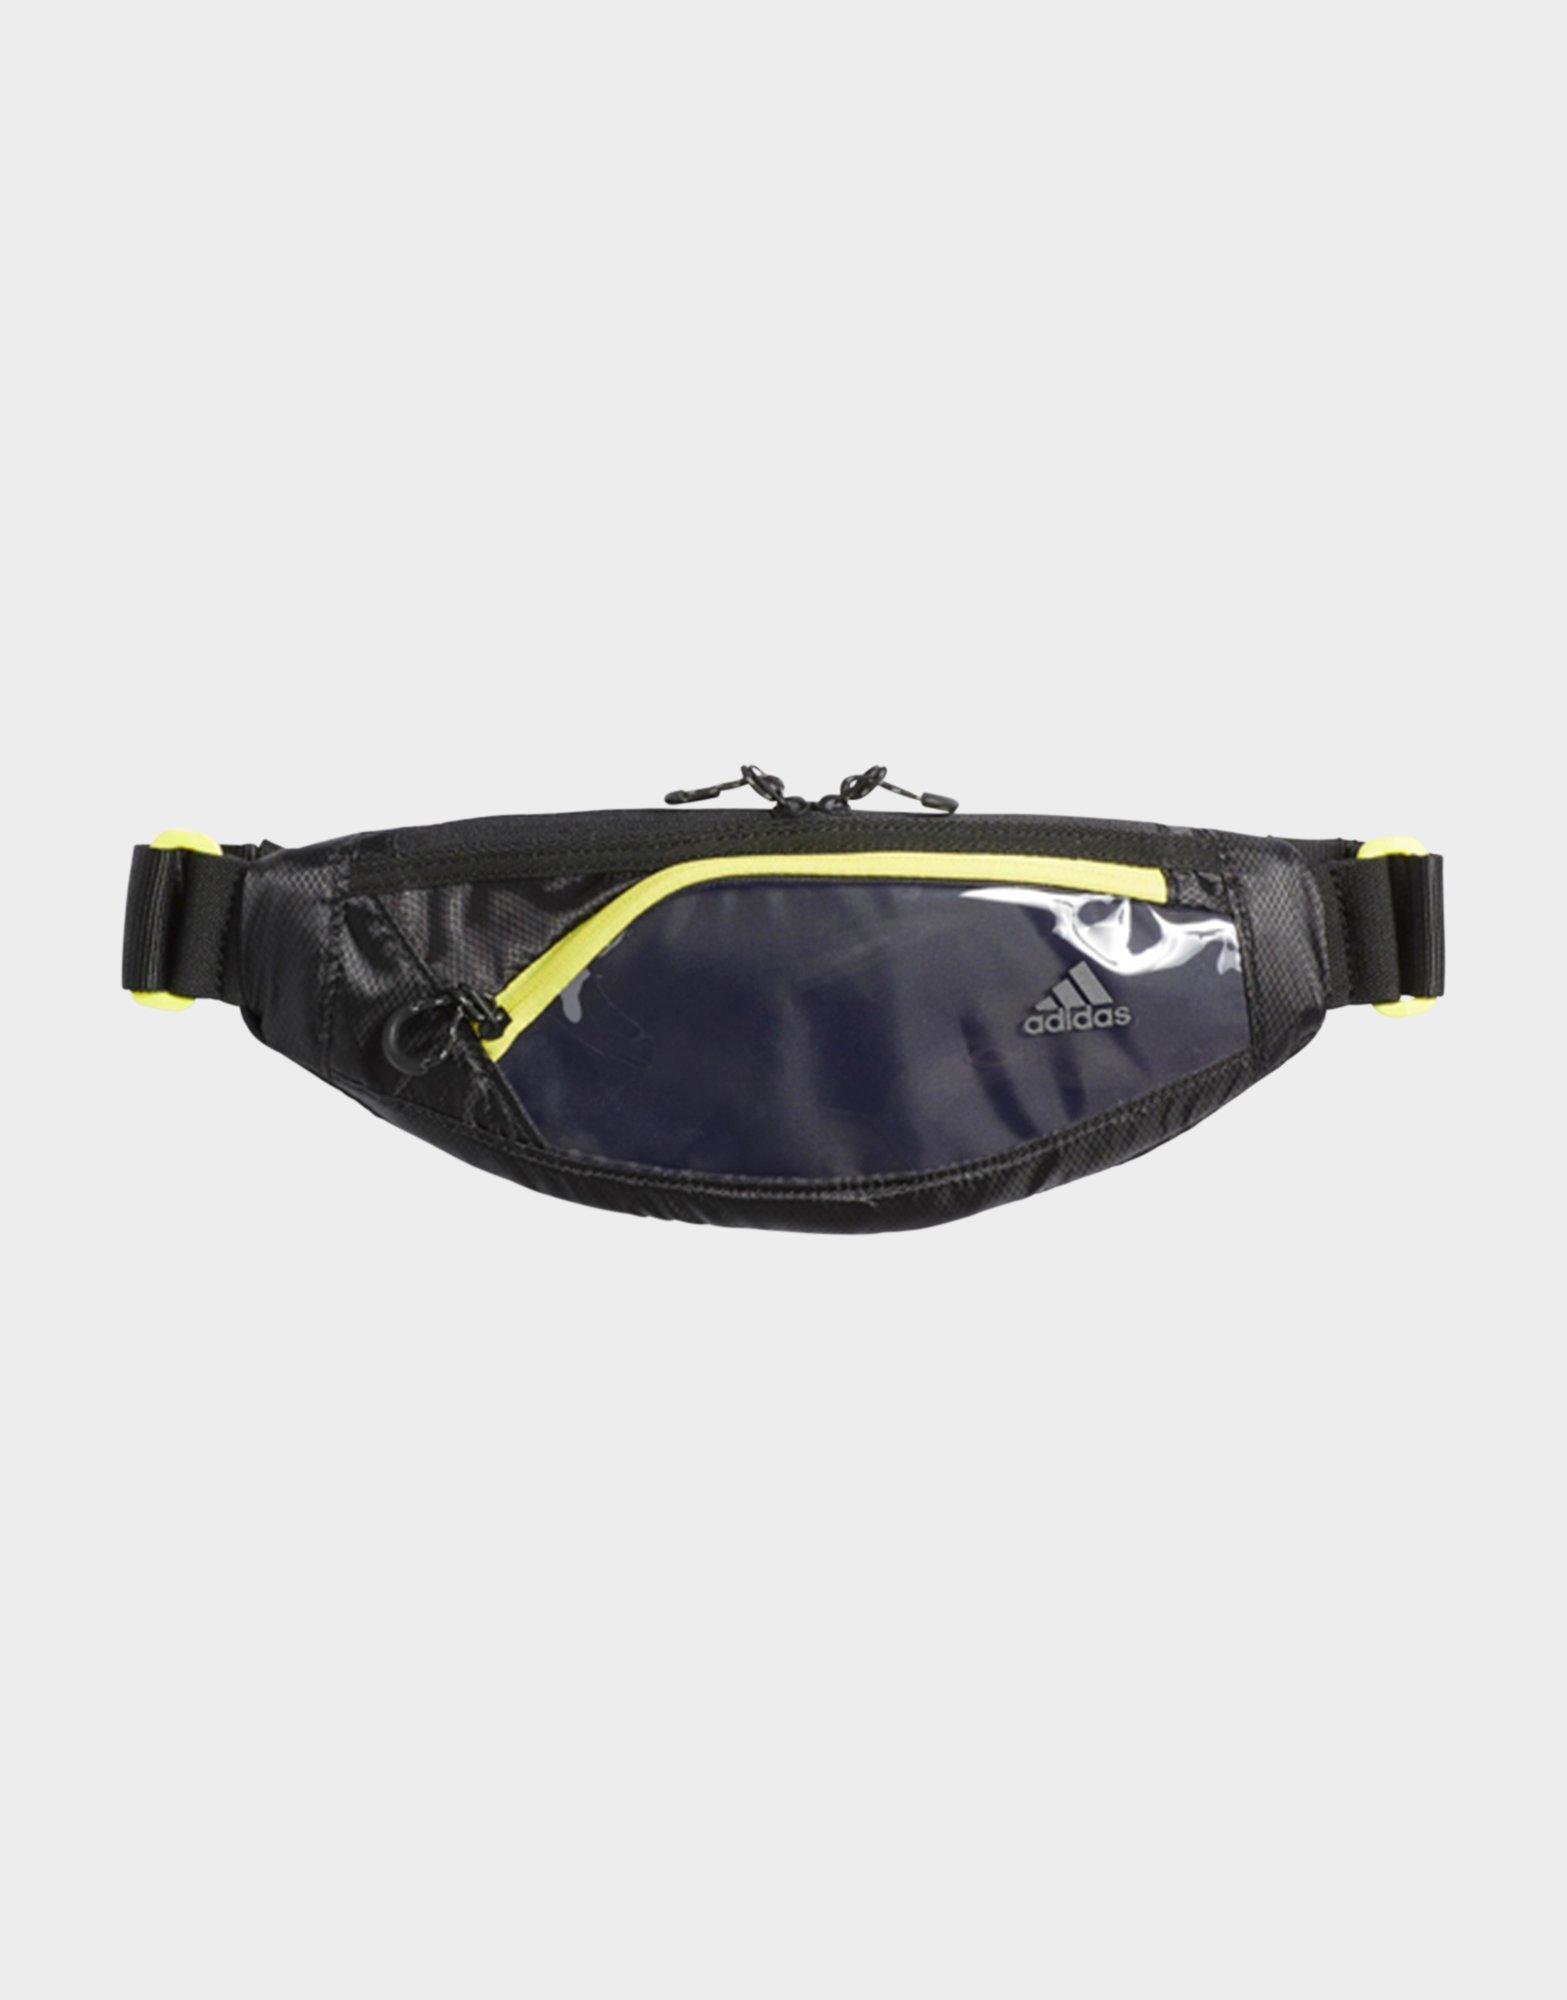 Adidas - Black Run Waist Bag for Men - Lyst. View fullscreen da36291266